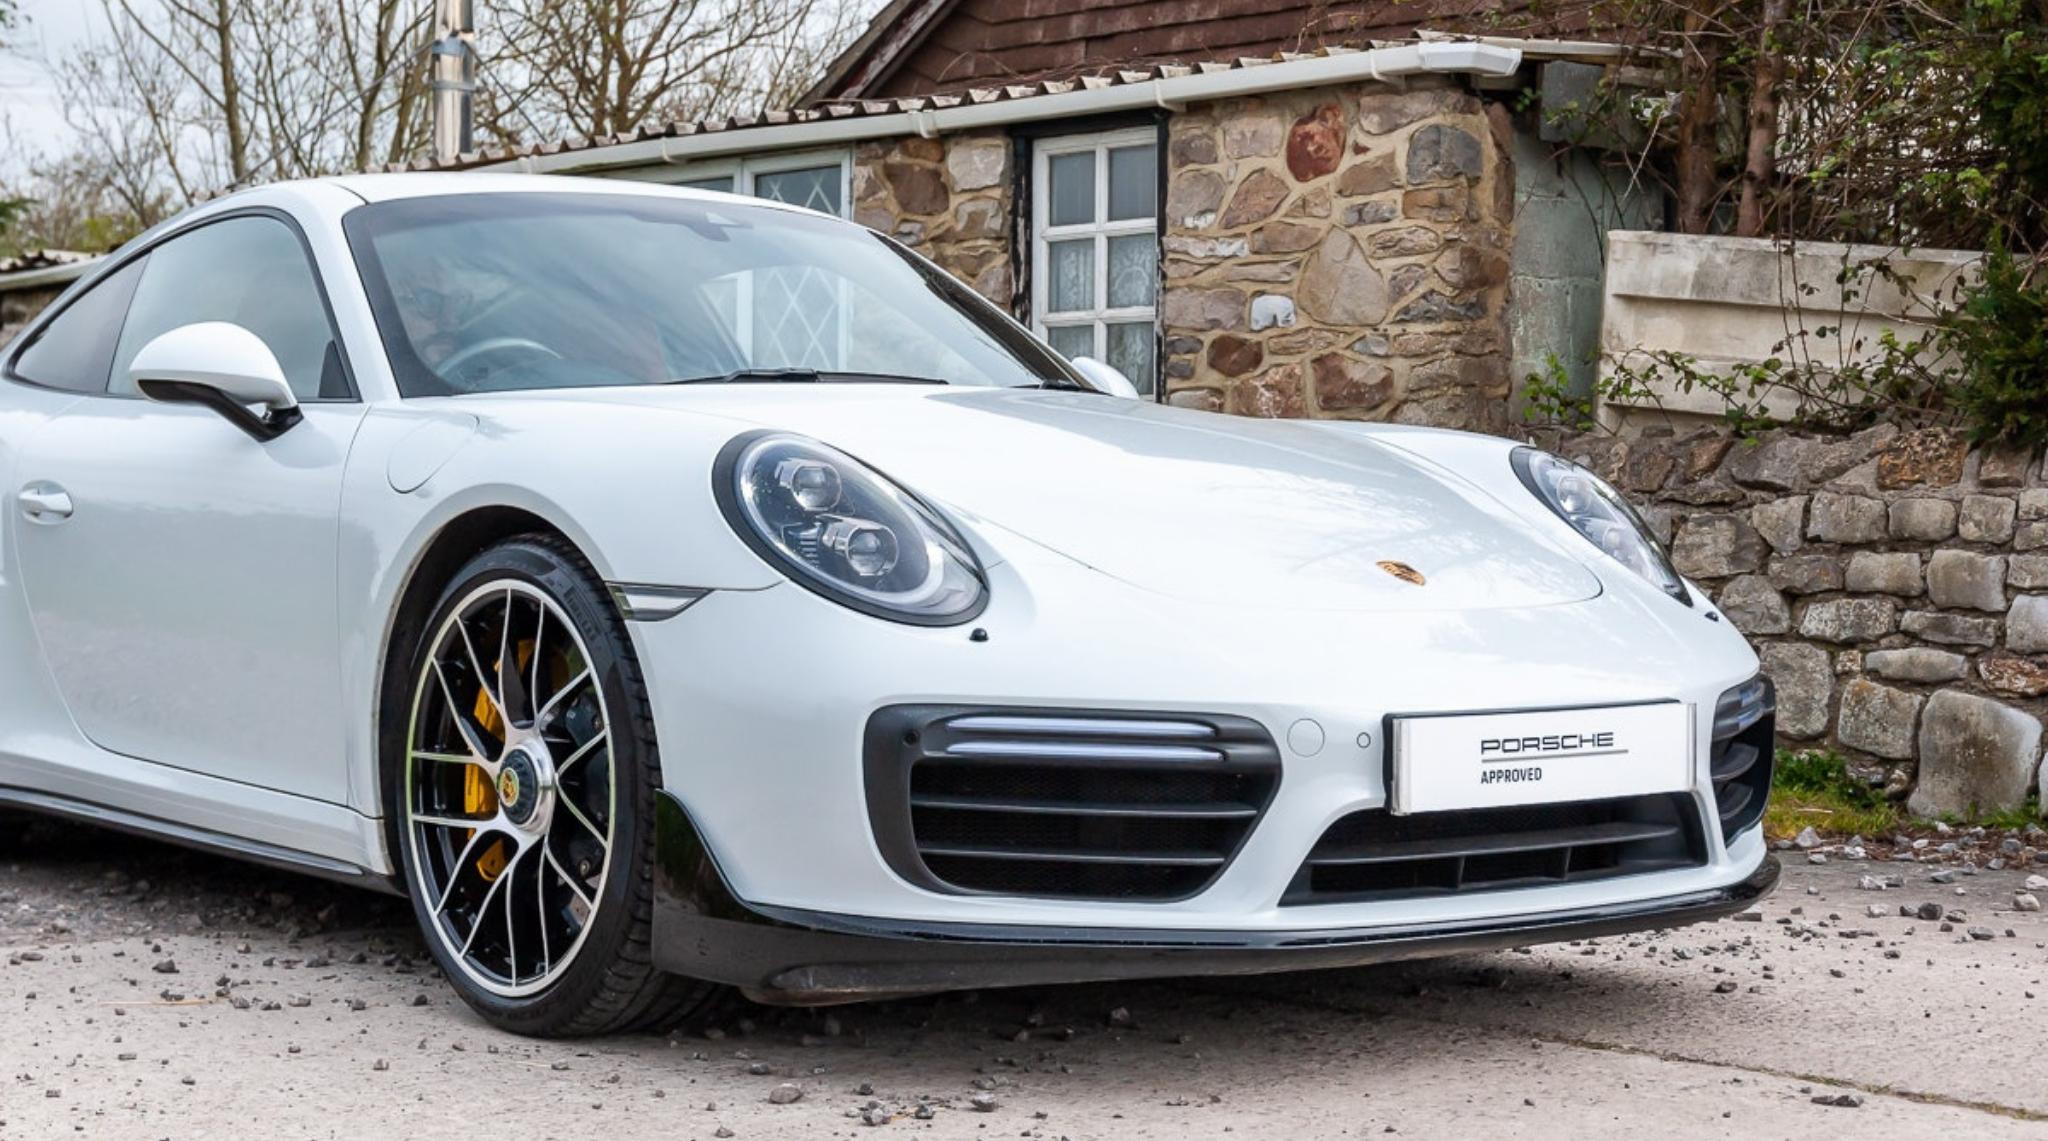 Porsche UK Staycation1